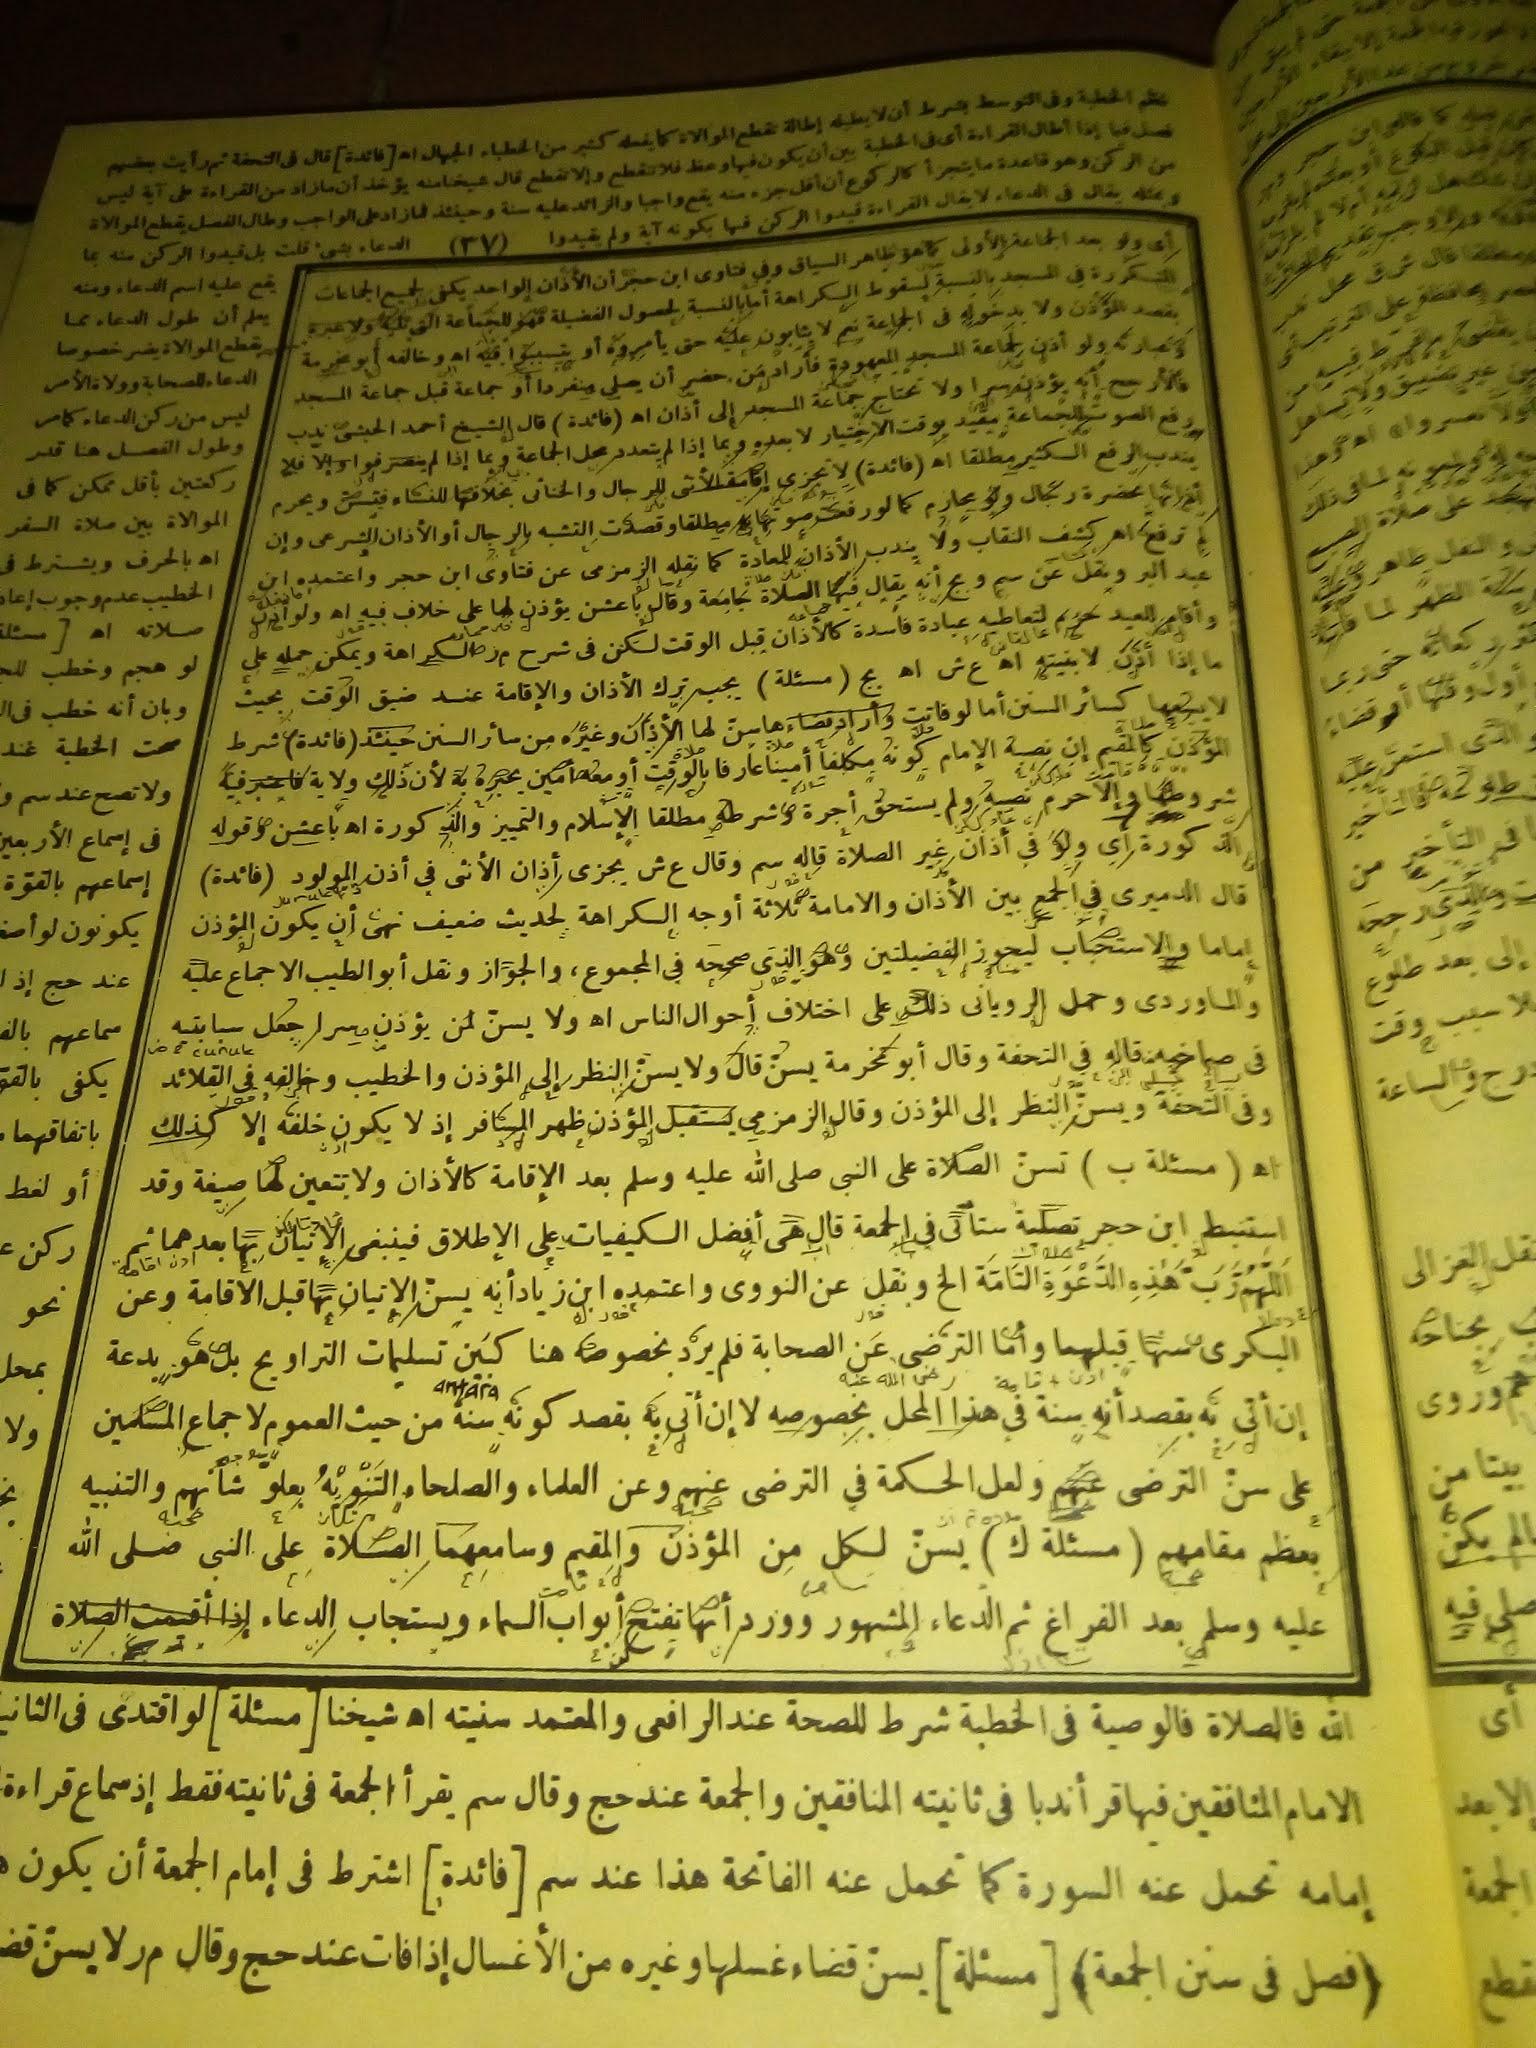 hukum-shalawat-sebelum-adzan-bughiyah-muatarsyidin